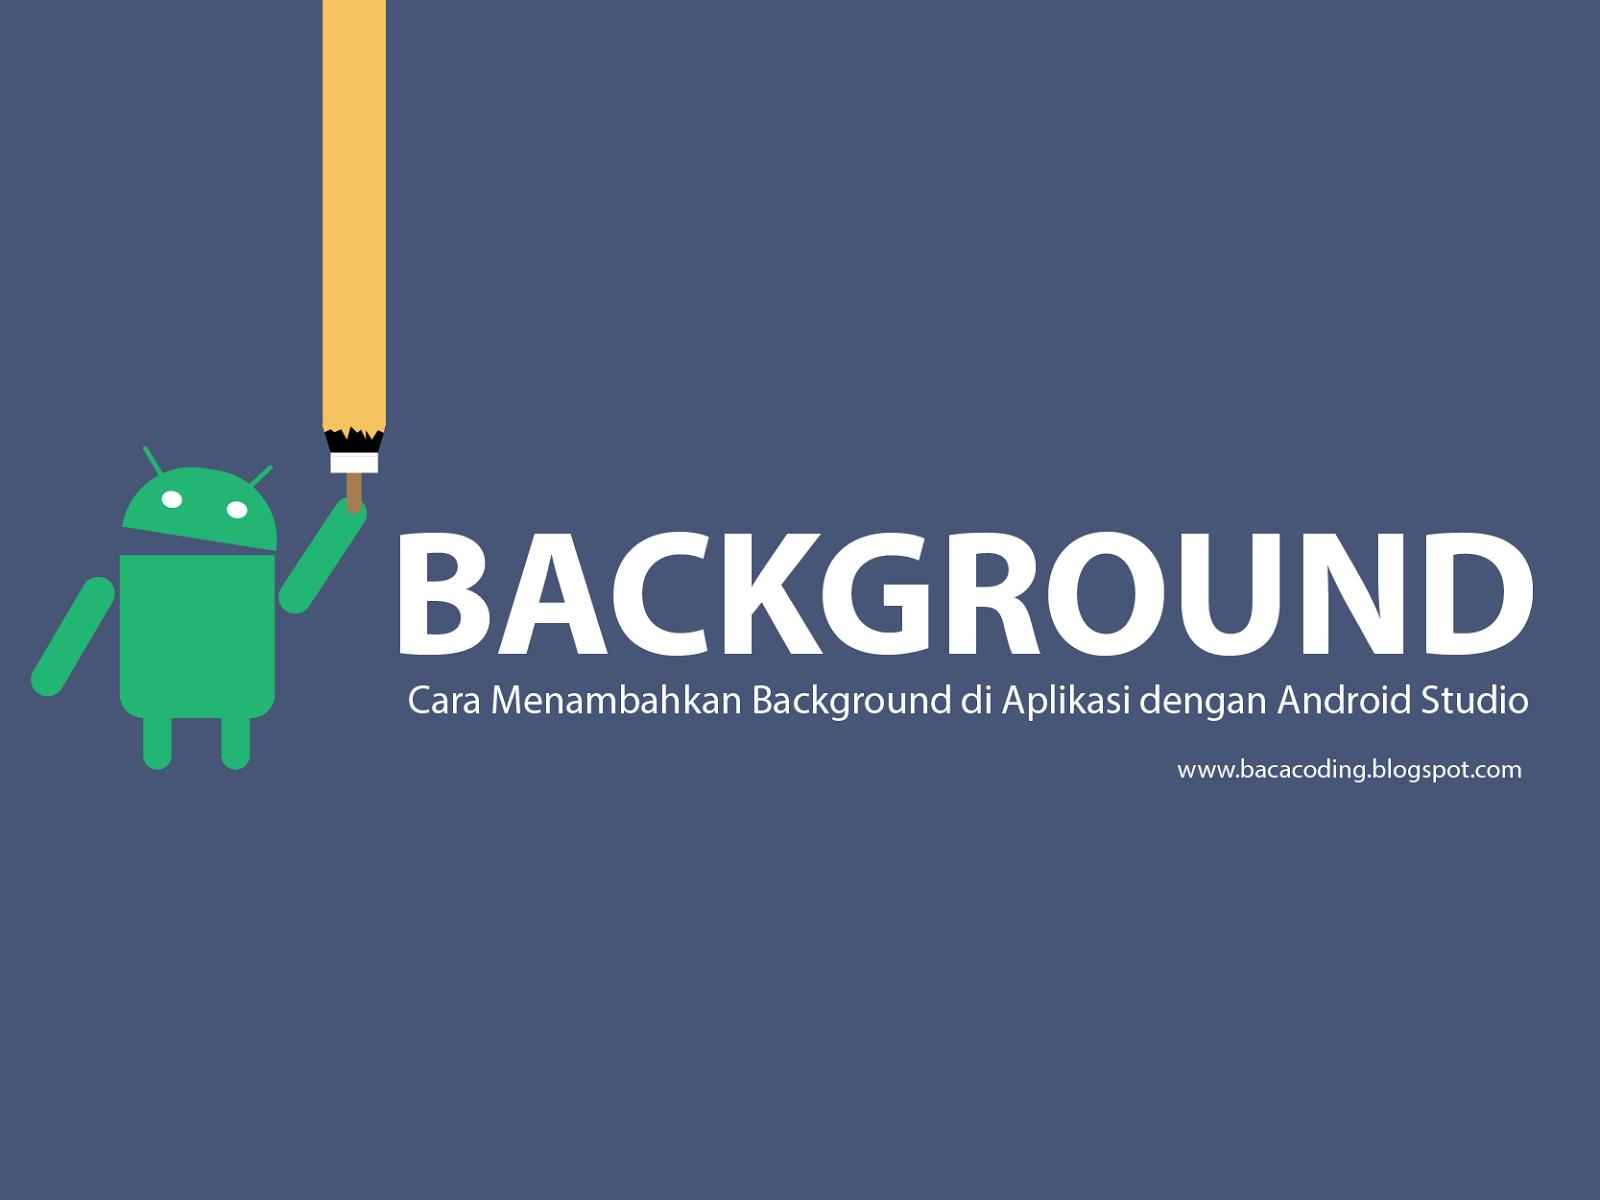 10 Aplikasi Wallpaper Android Gratis: Cara Ganti Background Aplikasi Dengan Android Studio